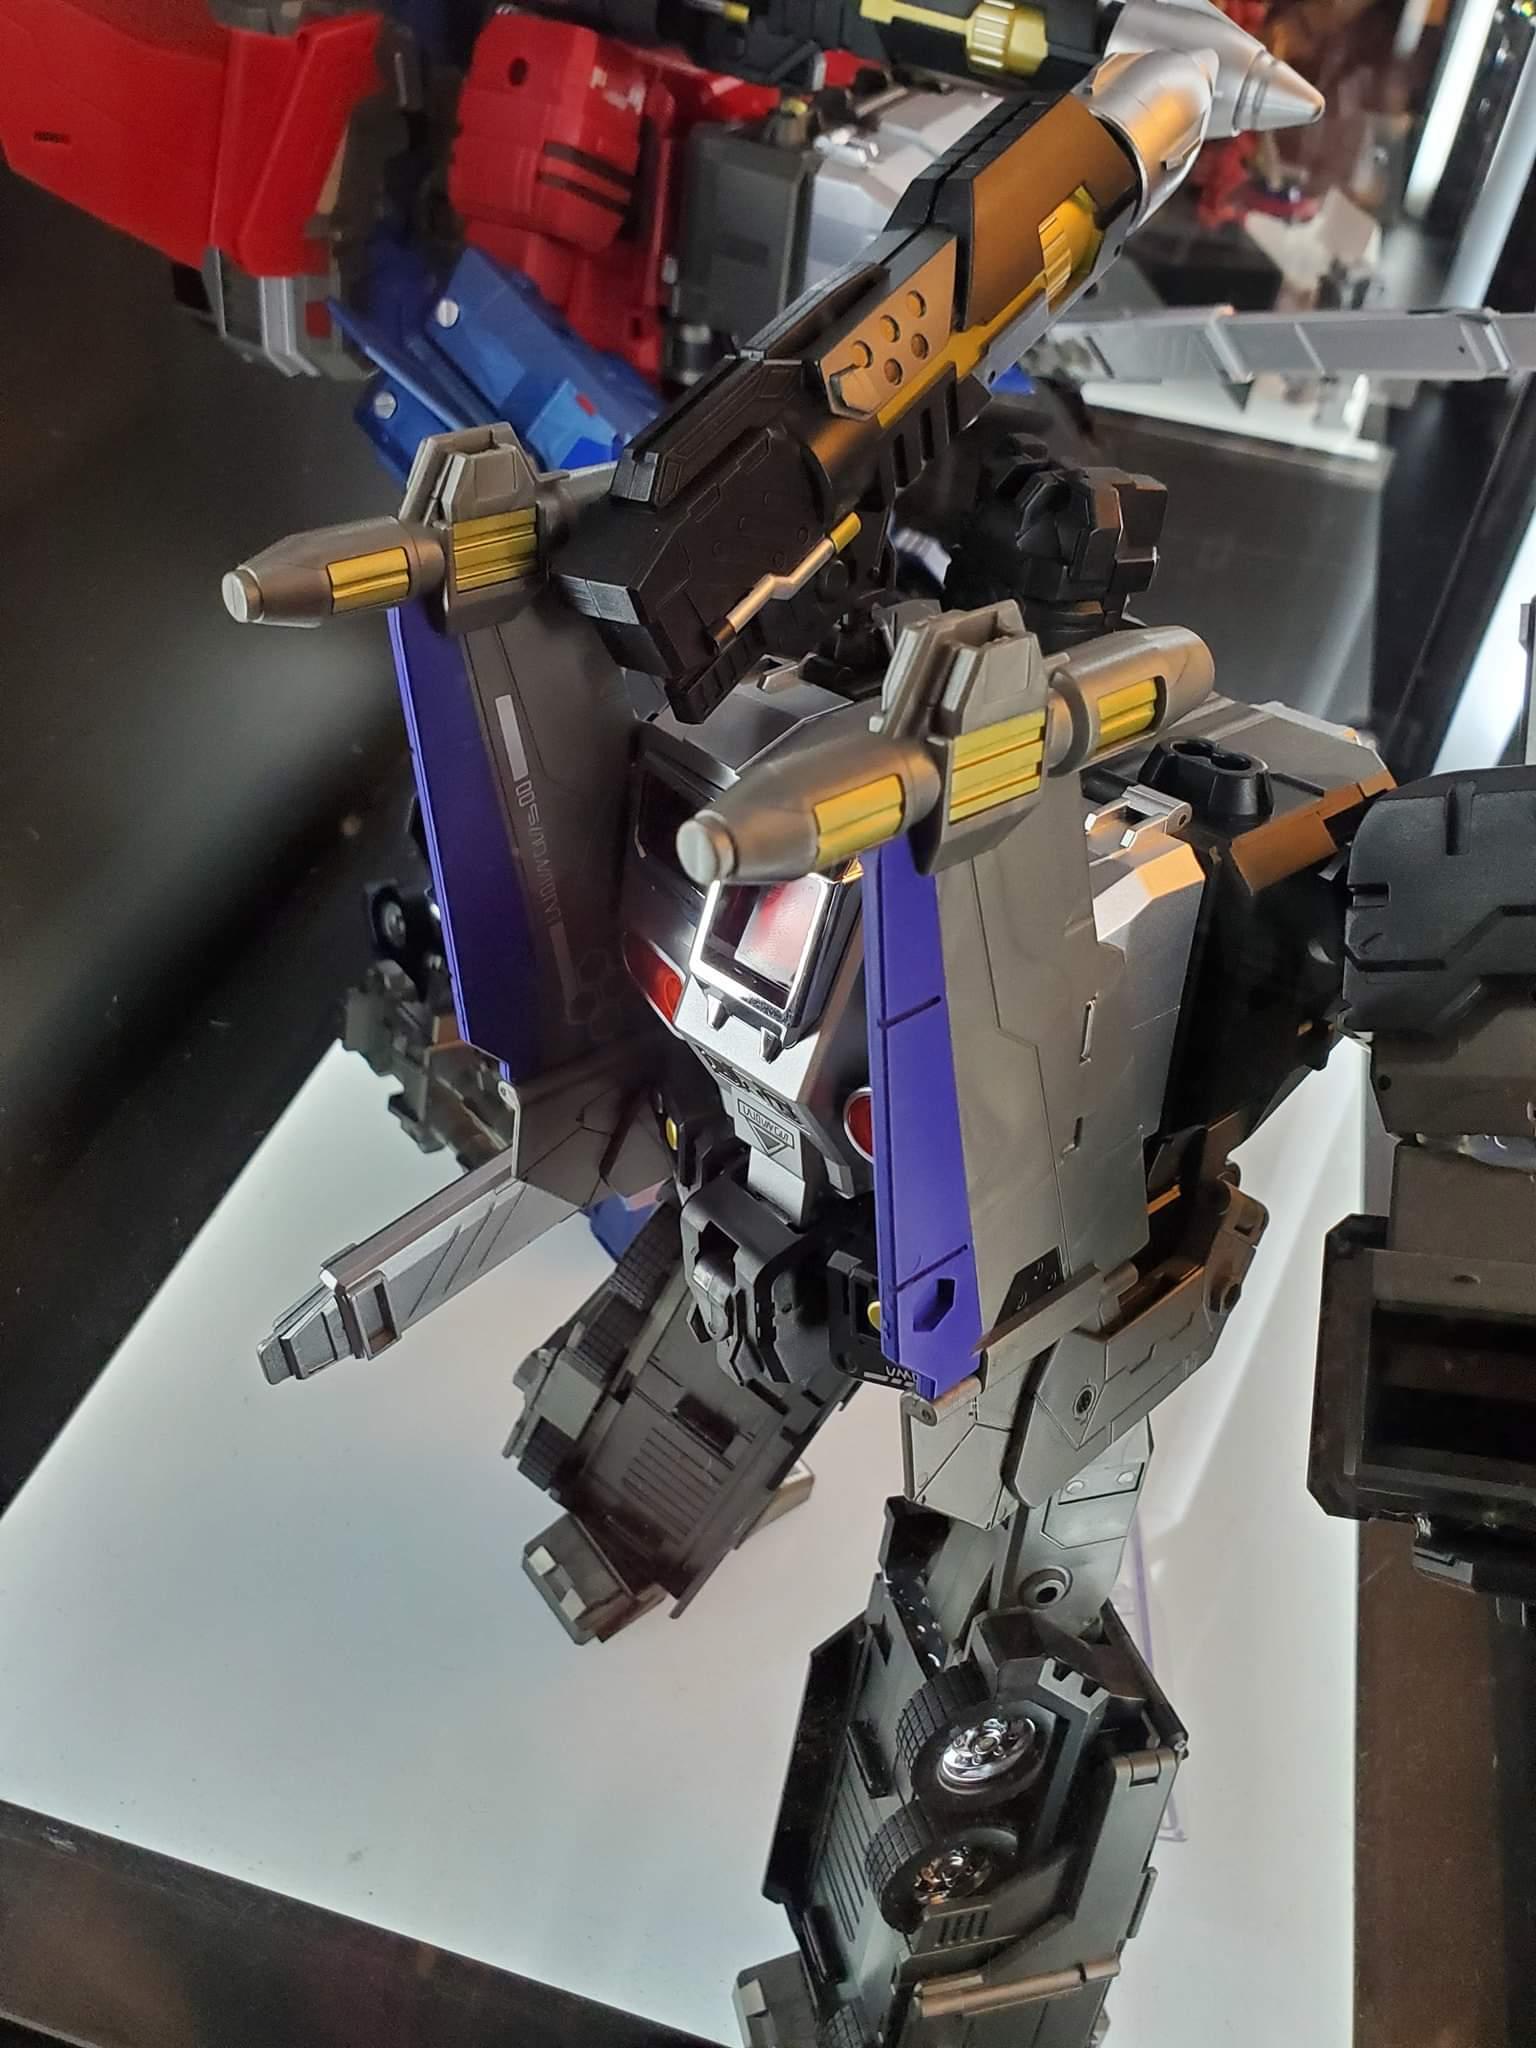 [FansHobby] Produit Tiers - MB-06 Power Baser (aka Powermaster Optimus) + MB-11 God Armour (aka Godbomber) - TF Masterforce - Page 4 IBxRPEkH_o